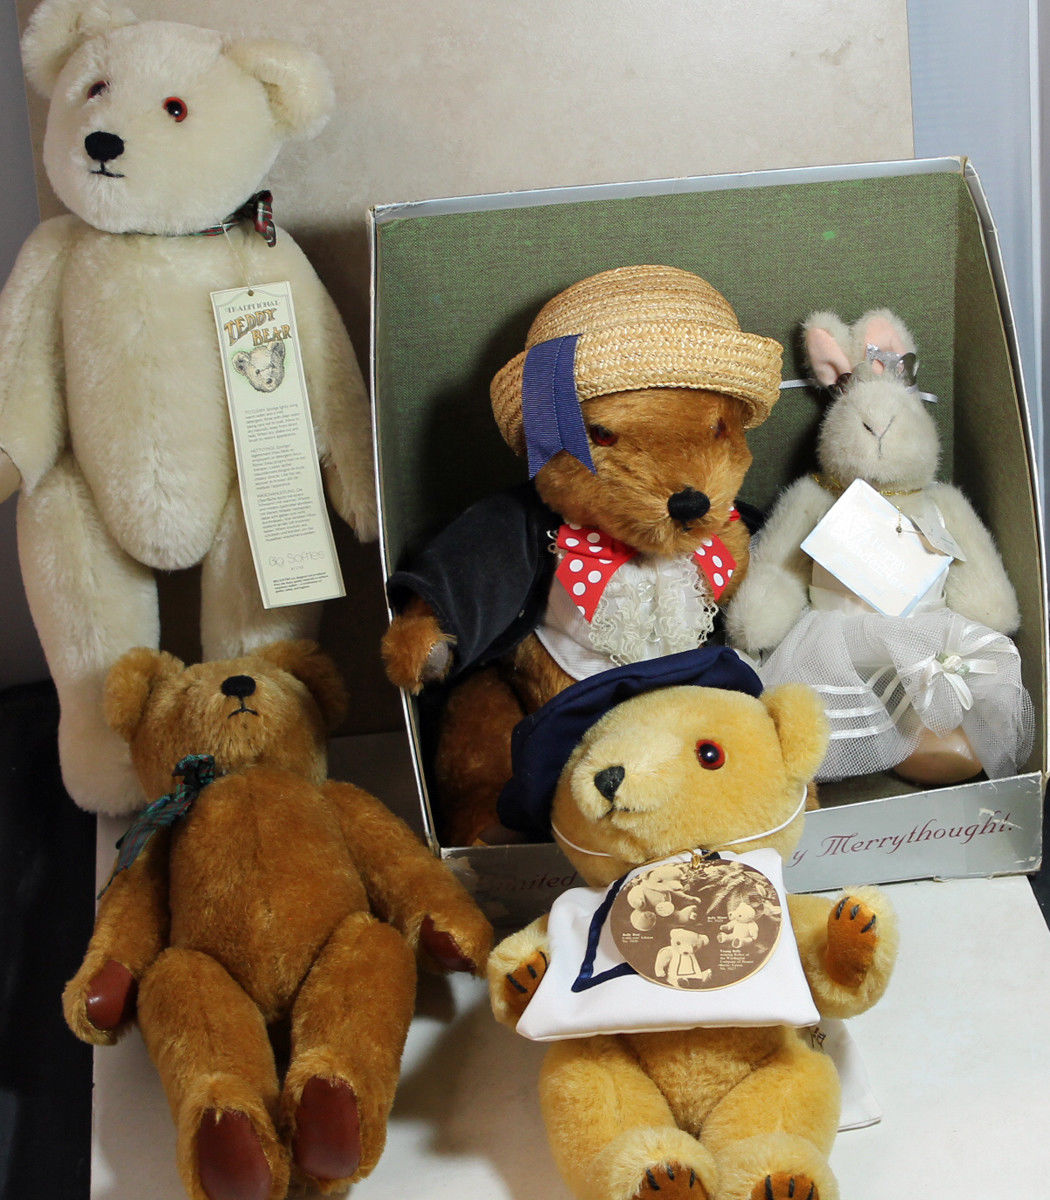 Lot of 5 Teddys  Bully orso, Muffy Veerorso, Veerorso, Veerorso, gree Softie (2), Merrythought 9a9465